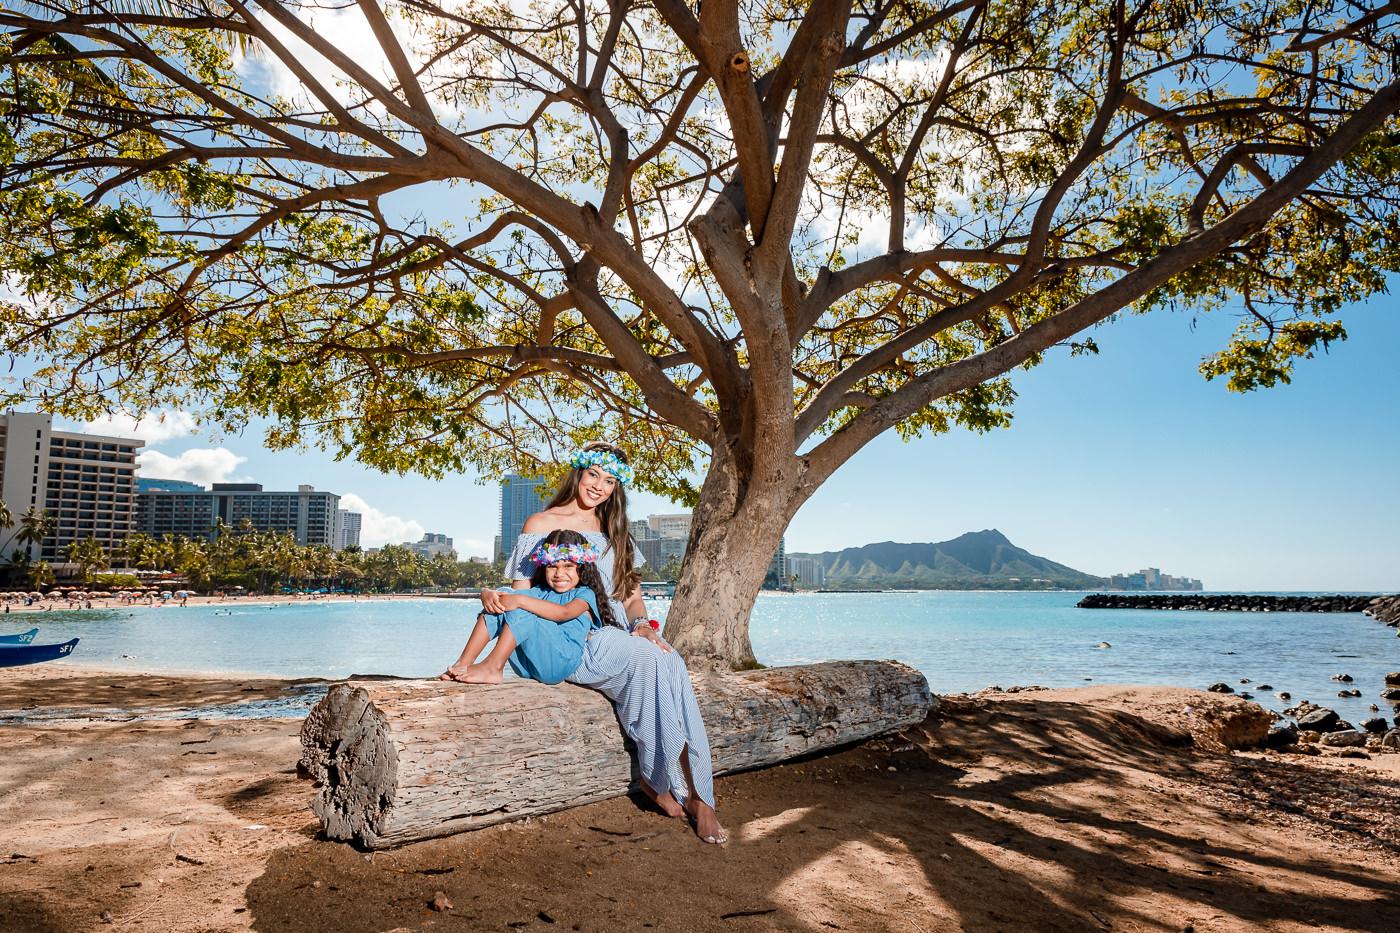 Oahu2019-3074.jpg